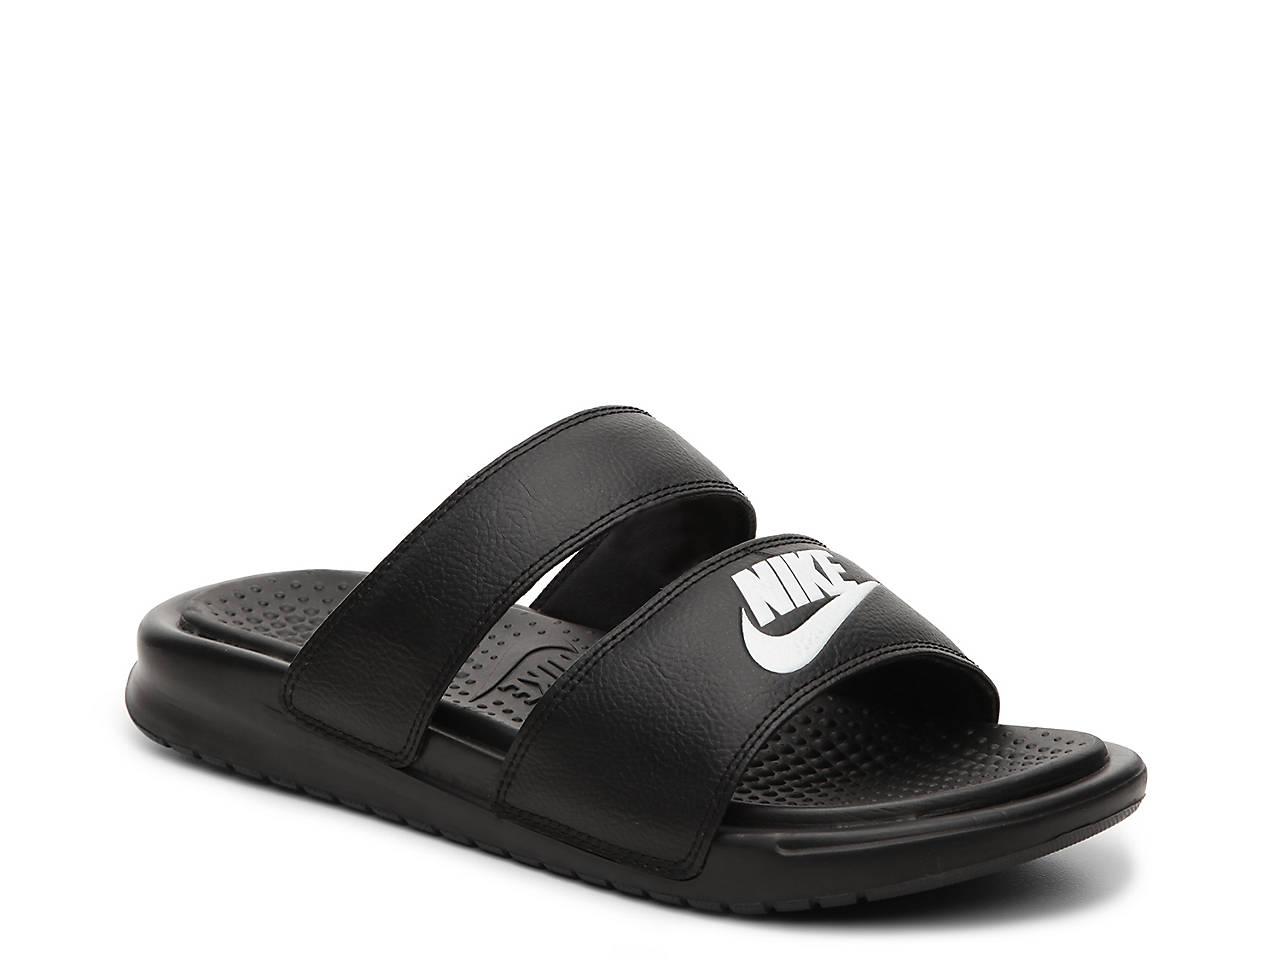 nike benassi duo ultra  slide sandalo le scarpe da donna dsw